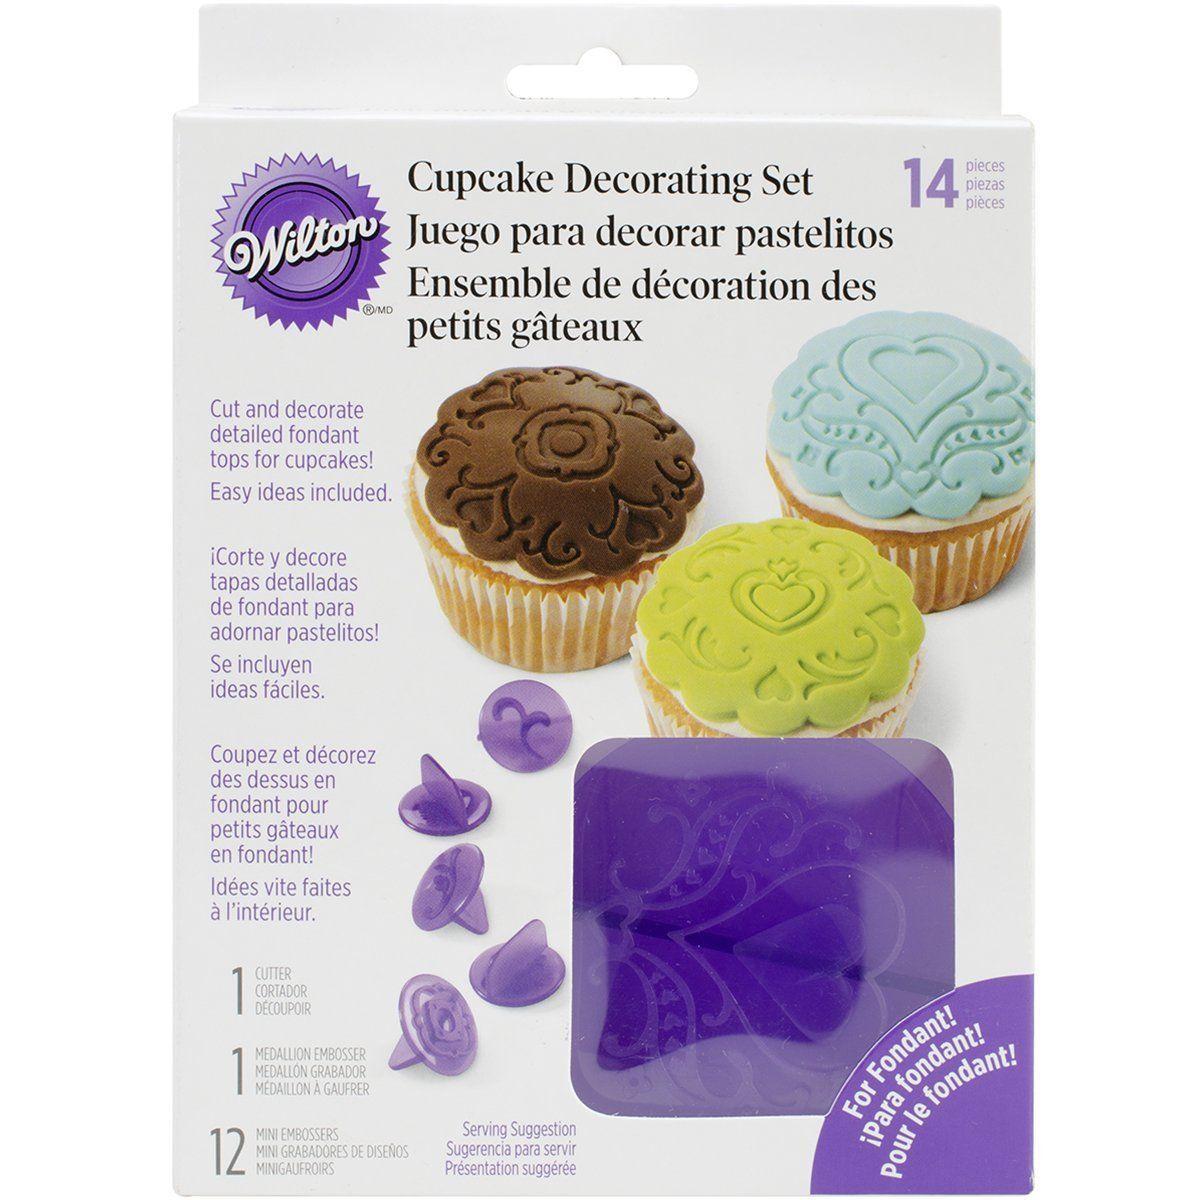 Create Festive Fondant Tops Sized To Precision With The Wilton Cupcake Decorating Set Hea Cupcake Decorating Supplies Cupcakes Decoration Cake Decorating Kits